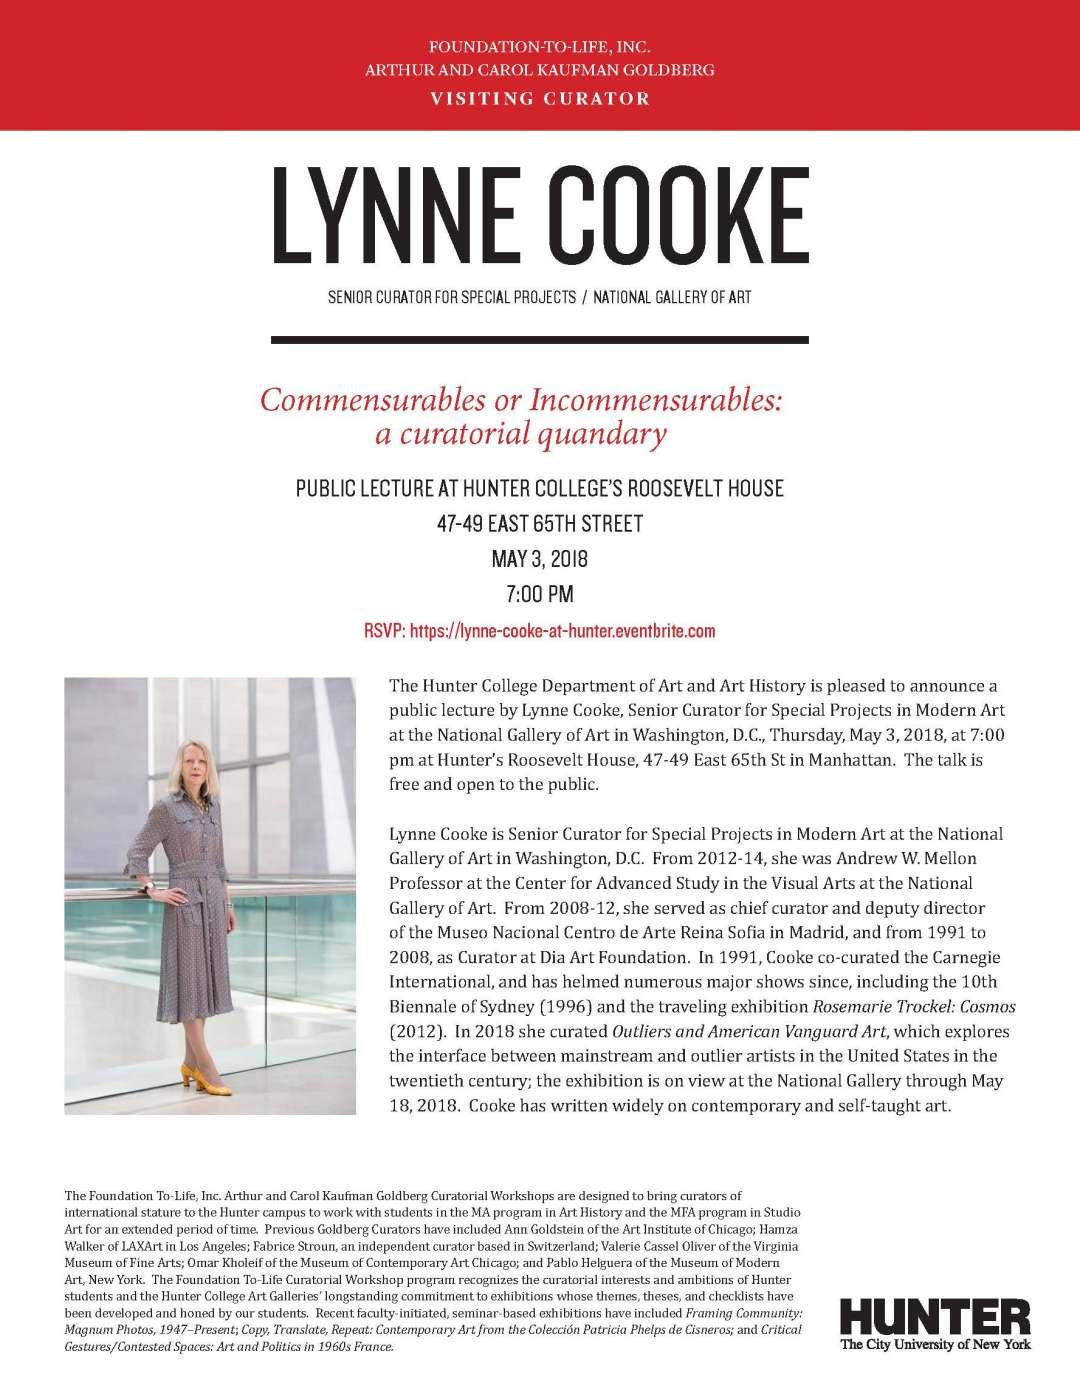 LYNNE-COOKE-GVC-v6